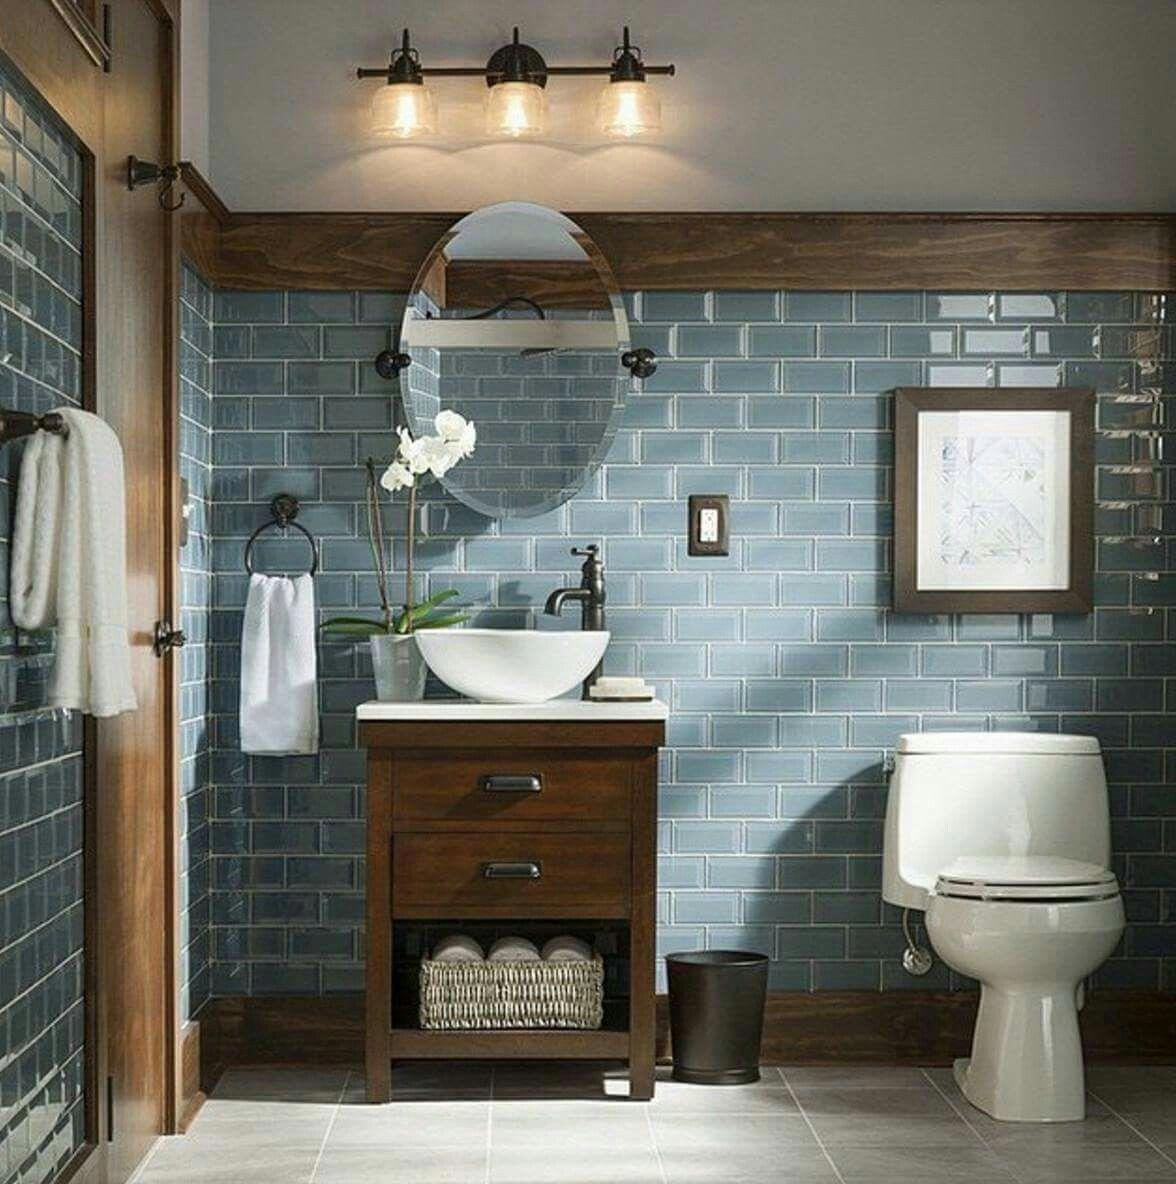 Rustic Kitchen Remodel Ideas Bathroom Remodel Master Rustic